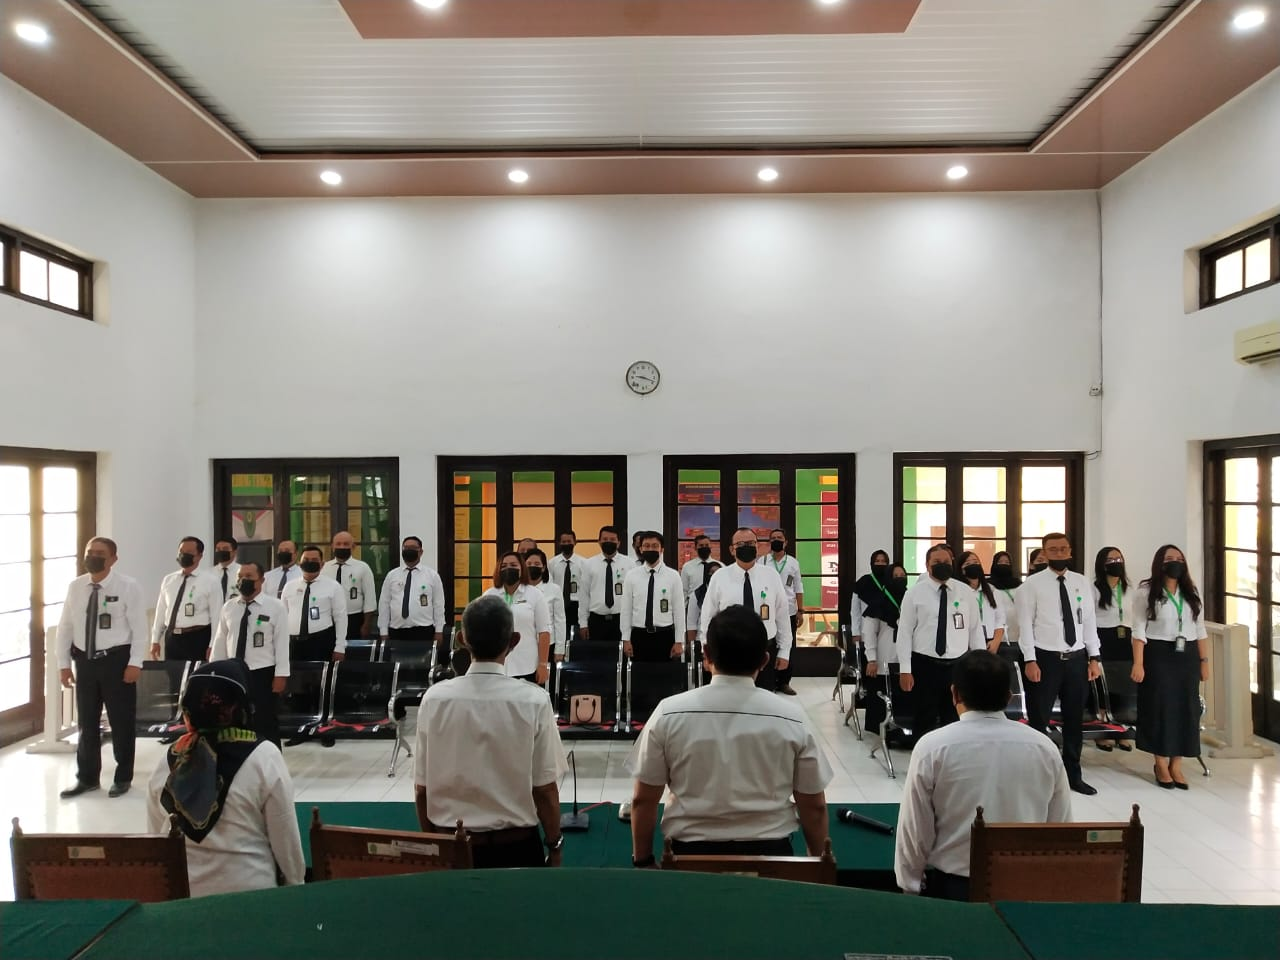 Penandatanganan Komitmen Bersama, Ikrar Bersama dan Pakta Integritas Pengadilan Negeri Tebing Tinggi Kelas I B